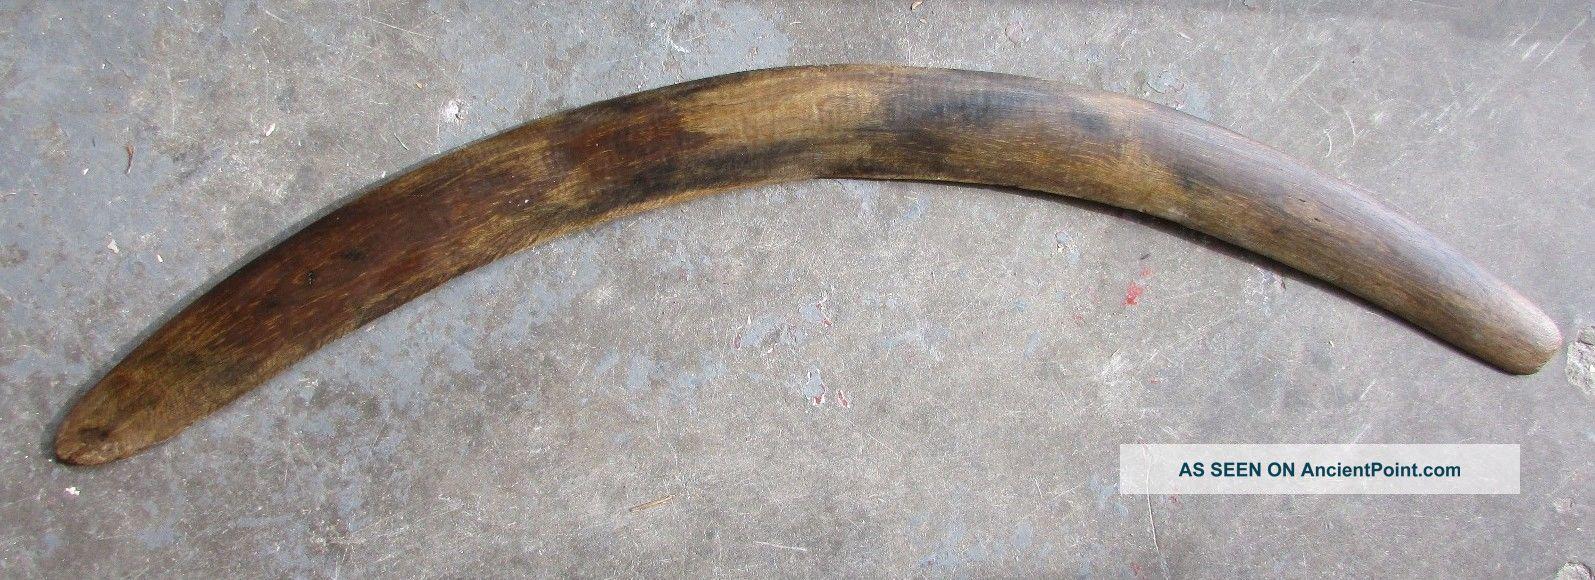 Large Old Central Australian Aboriginal Boomerang Pacific Islands & Oceania photo